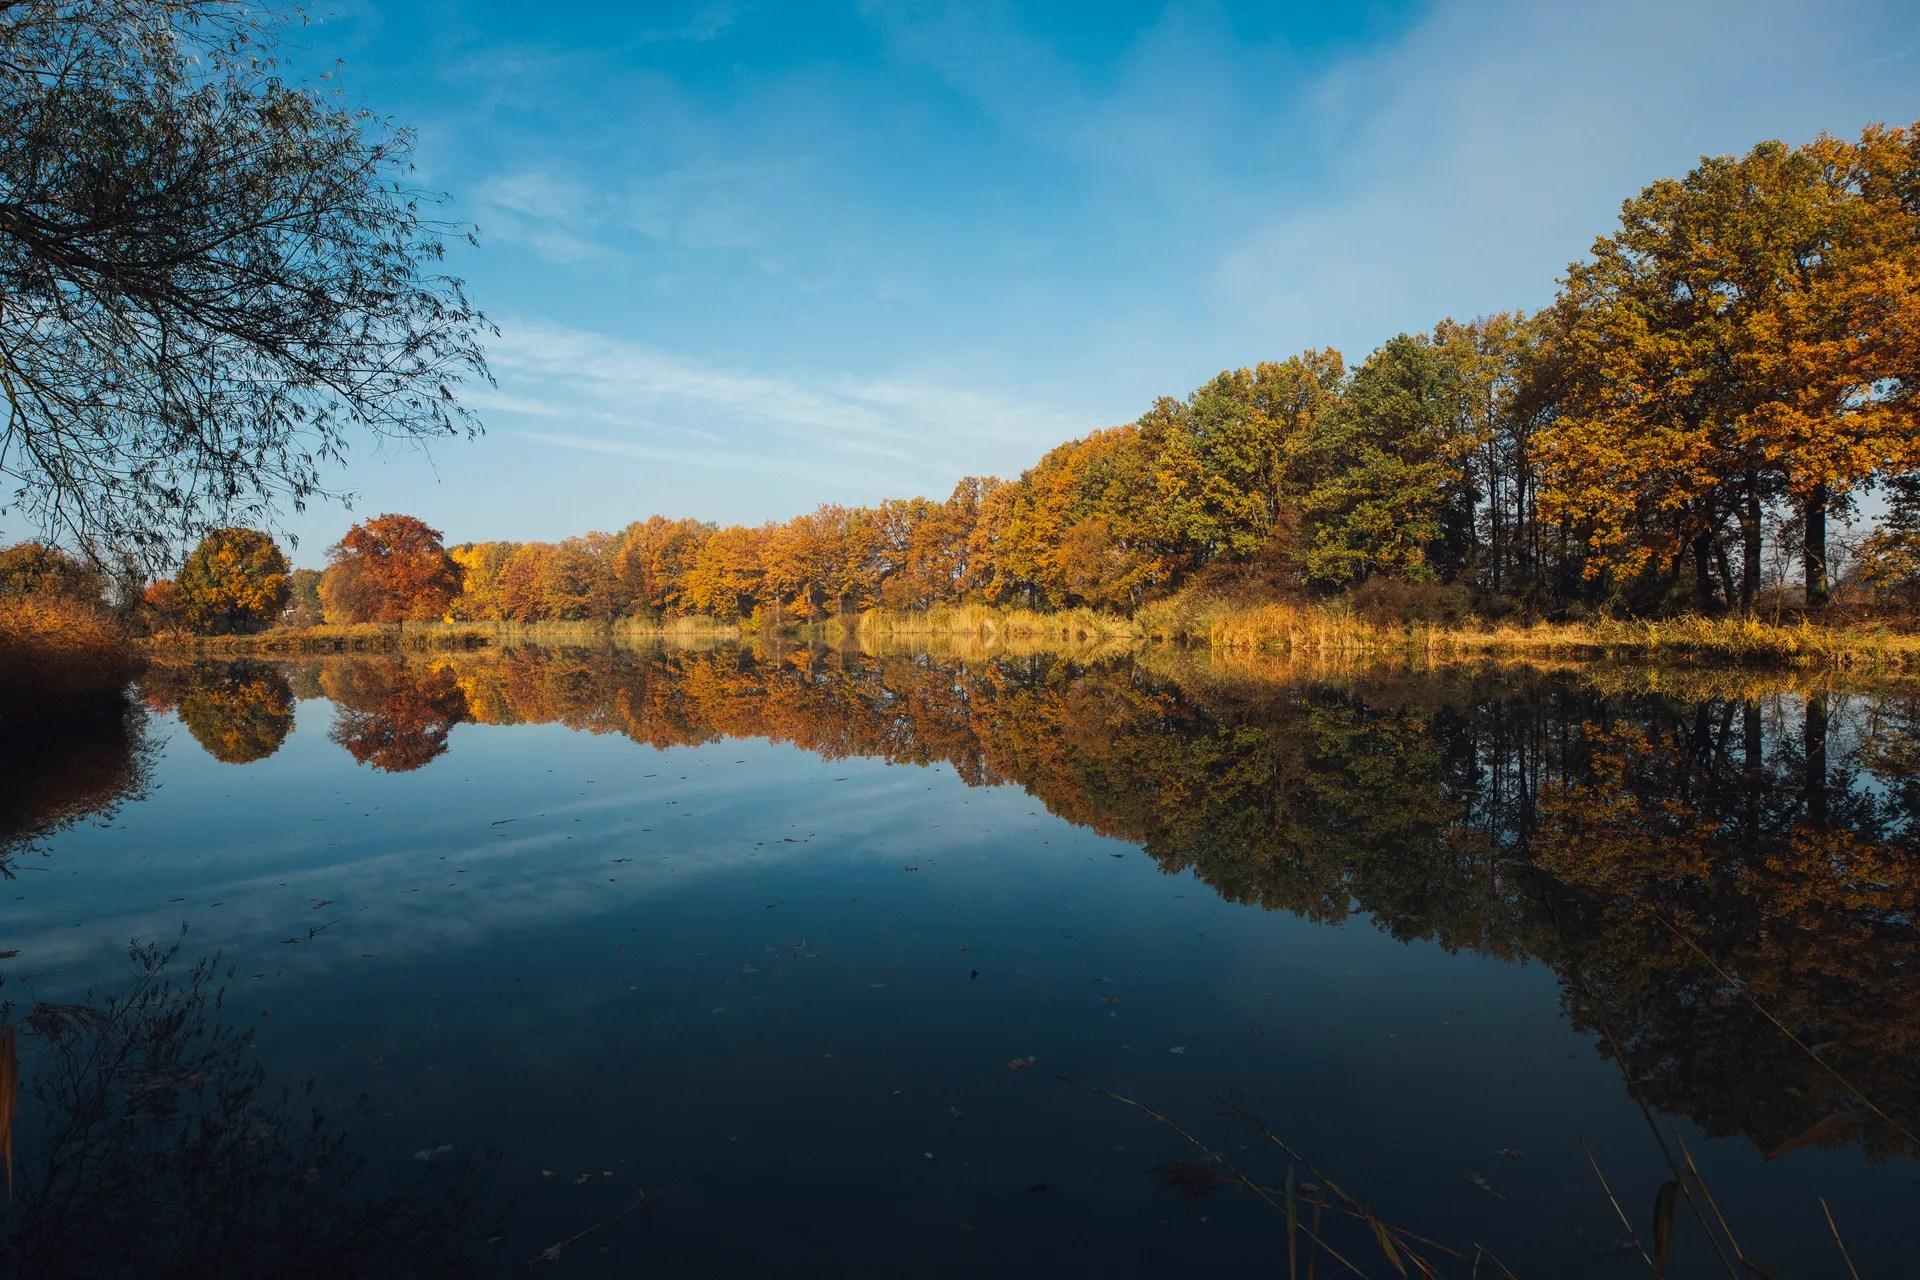 Portland Oregon Fall Had Wallpaper Stunning Fall Scenery Maple Tree Japanese Gardens